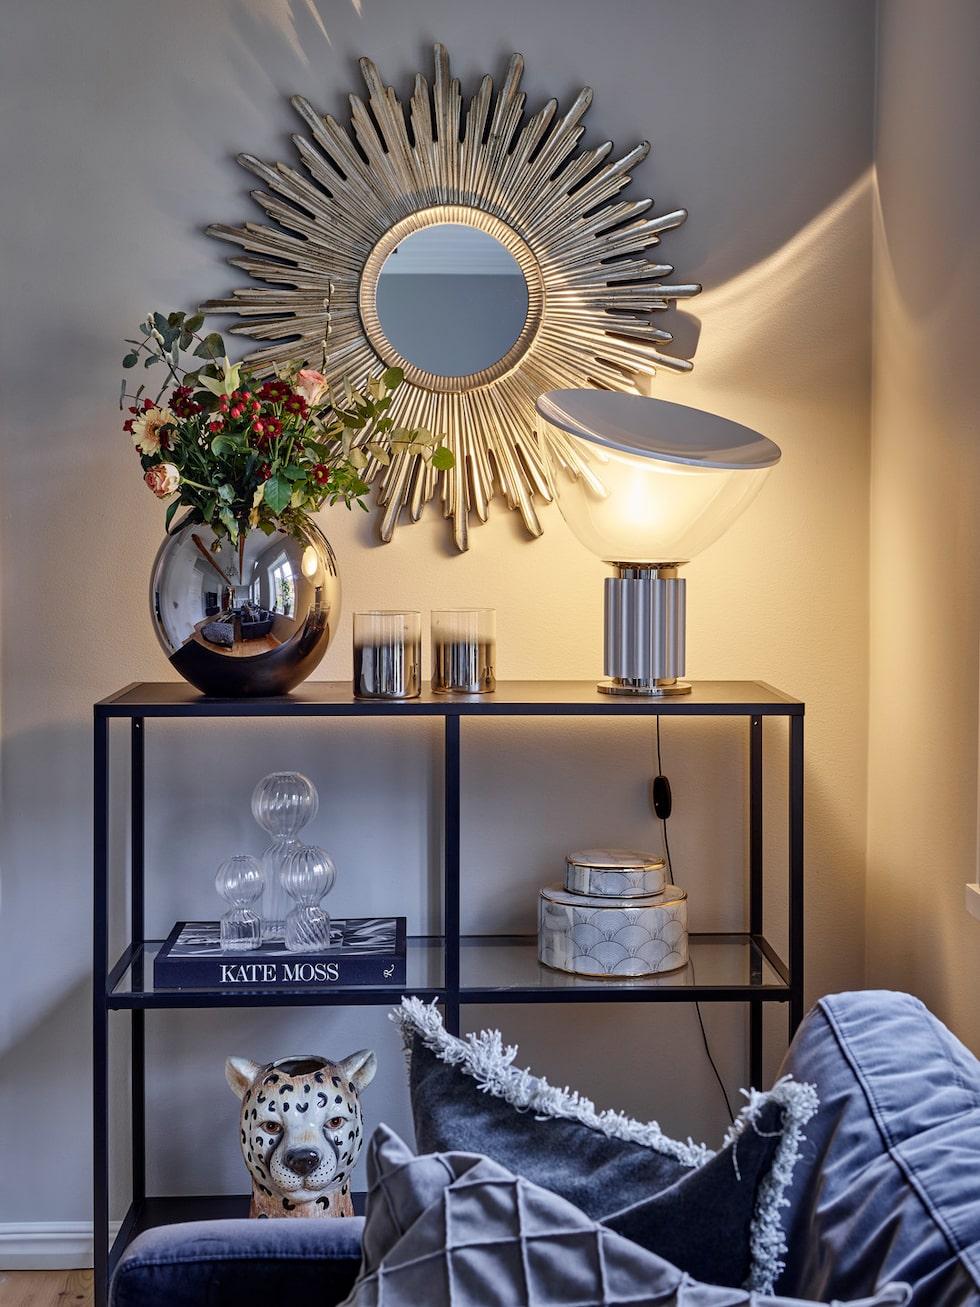 Sideboard, Ikea. Soffa, Sofacompany. Lampa, Flos. Tigervas, By On.